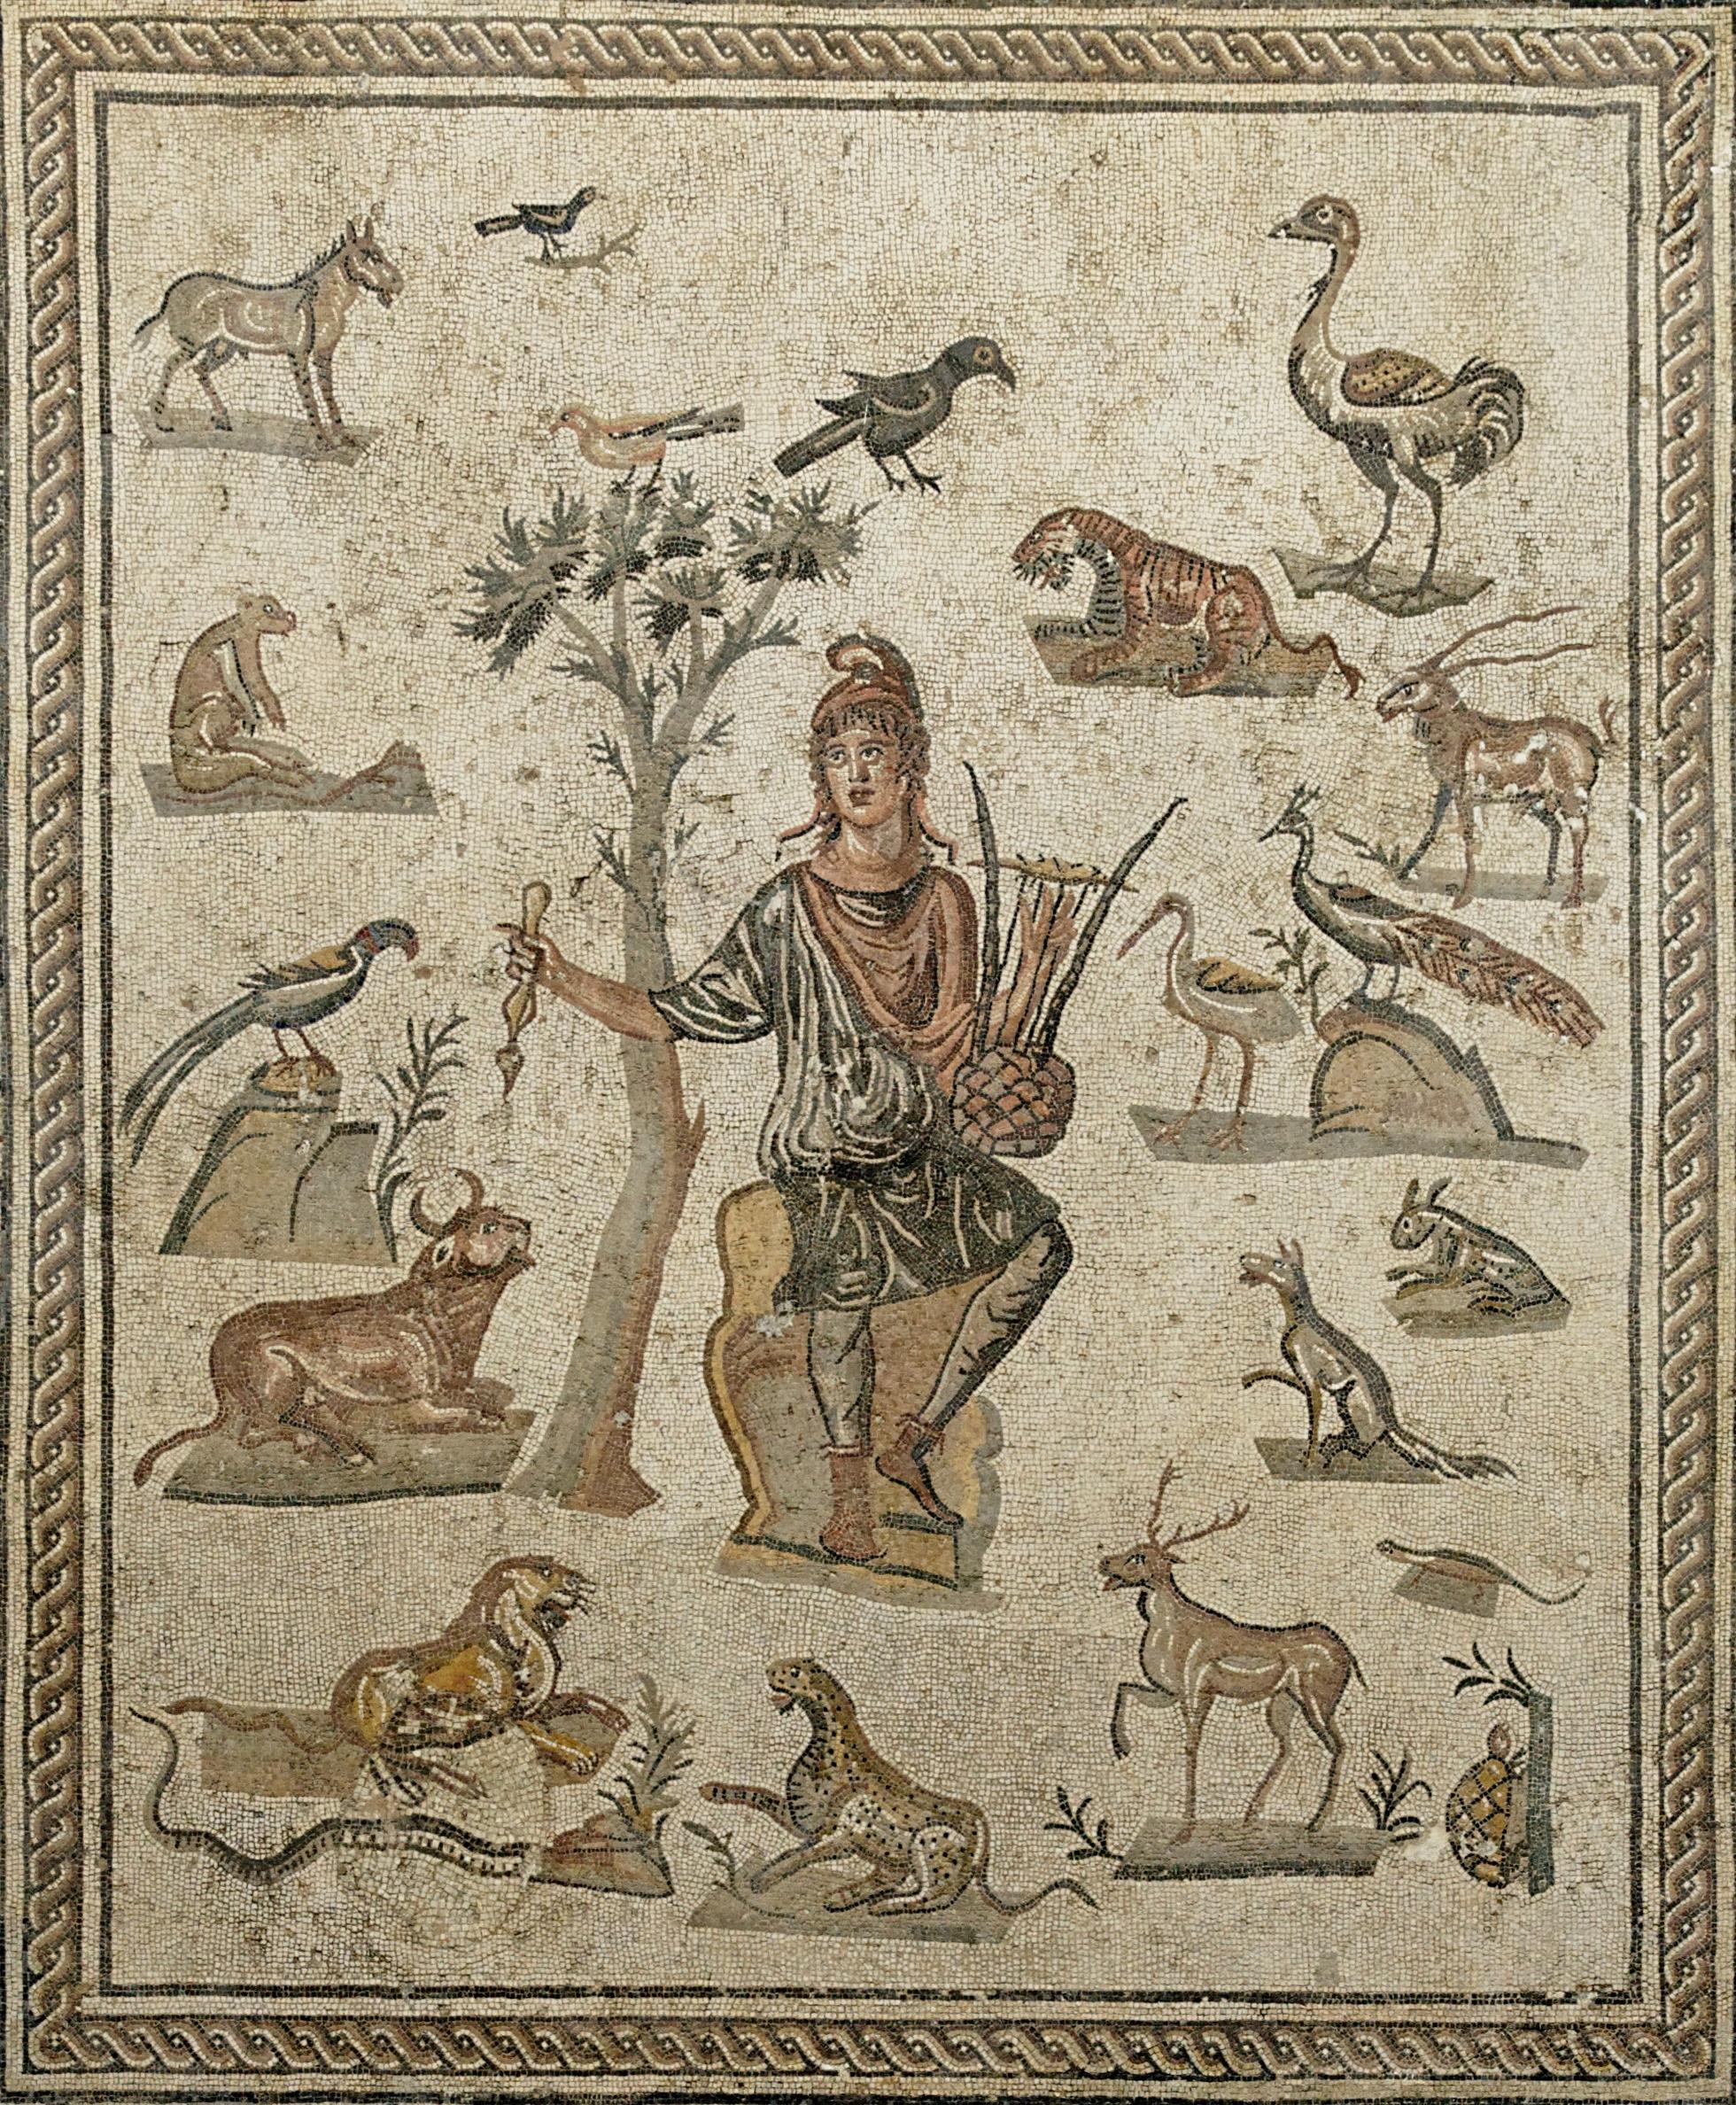 Orpheus with animals. (Roman mosaic ca. 200-250 AD)